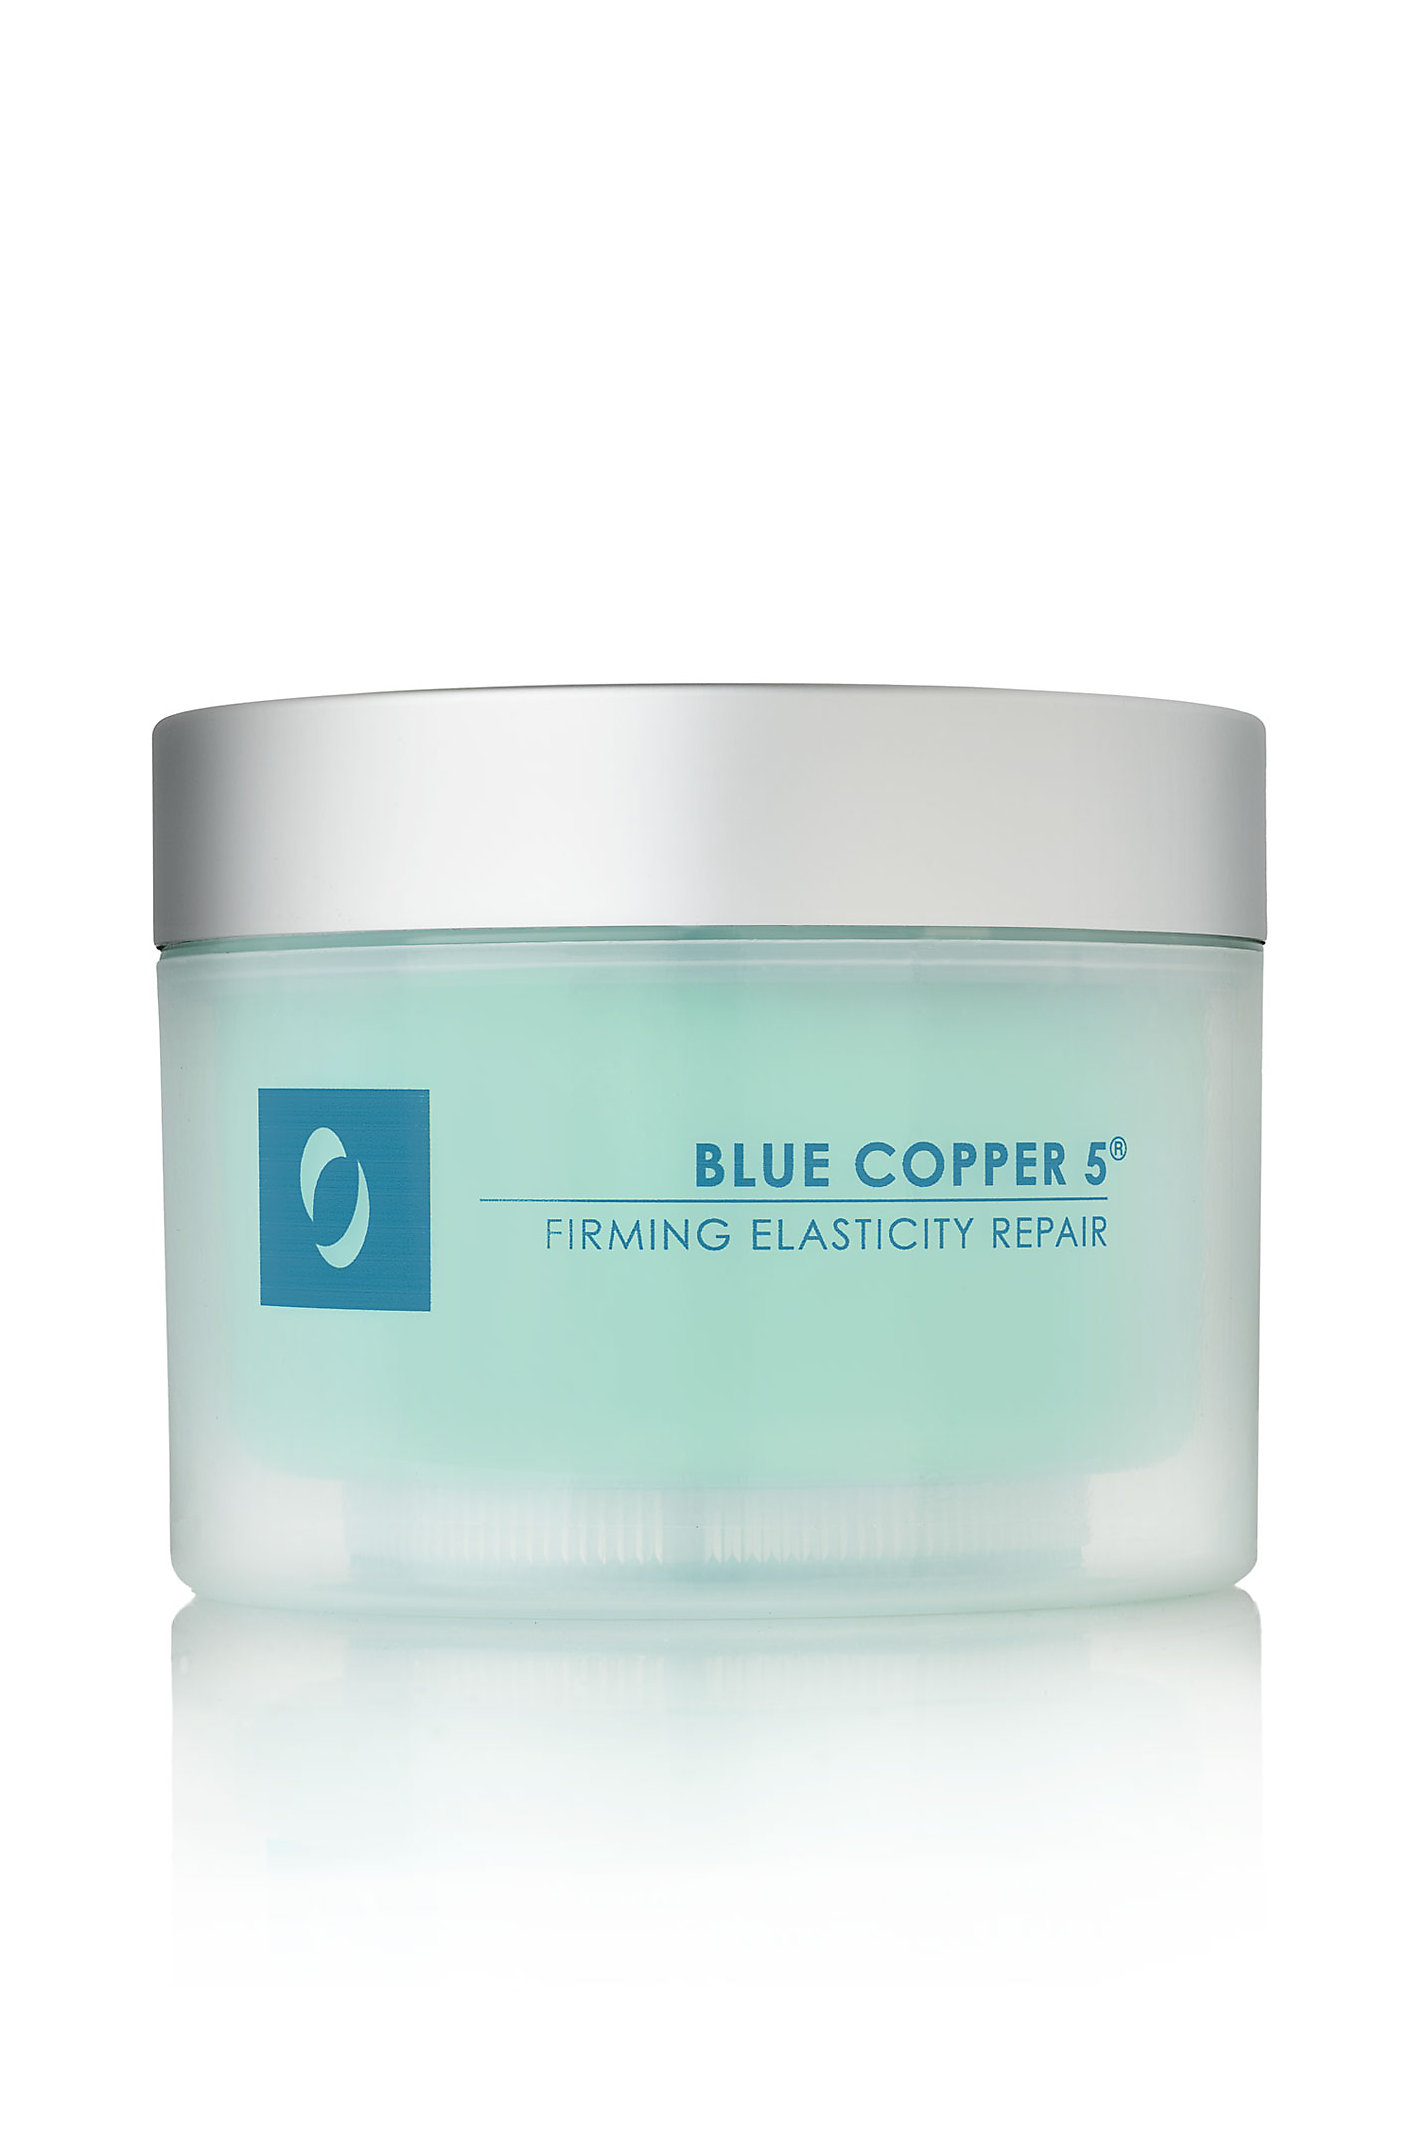 Blue Copper 5 Firming Elasticity Repair